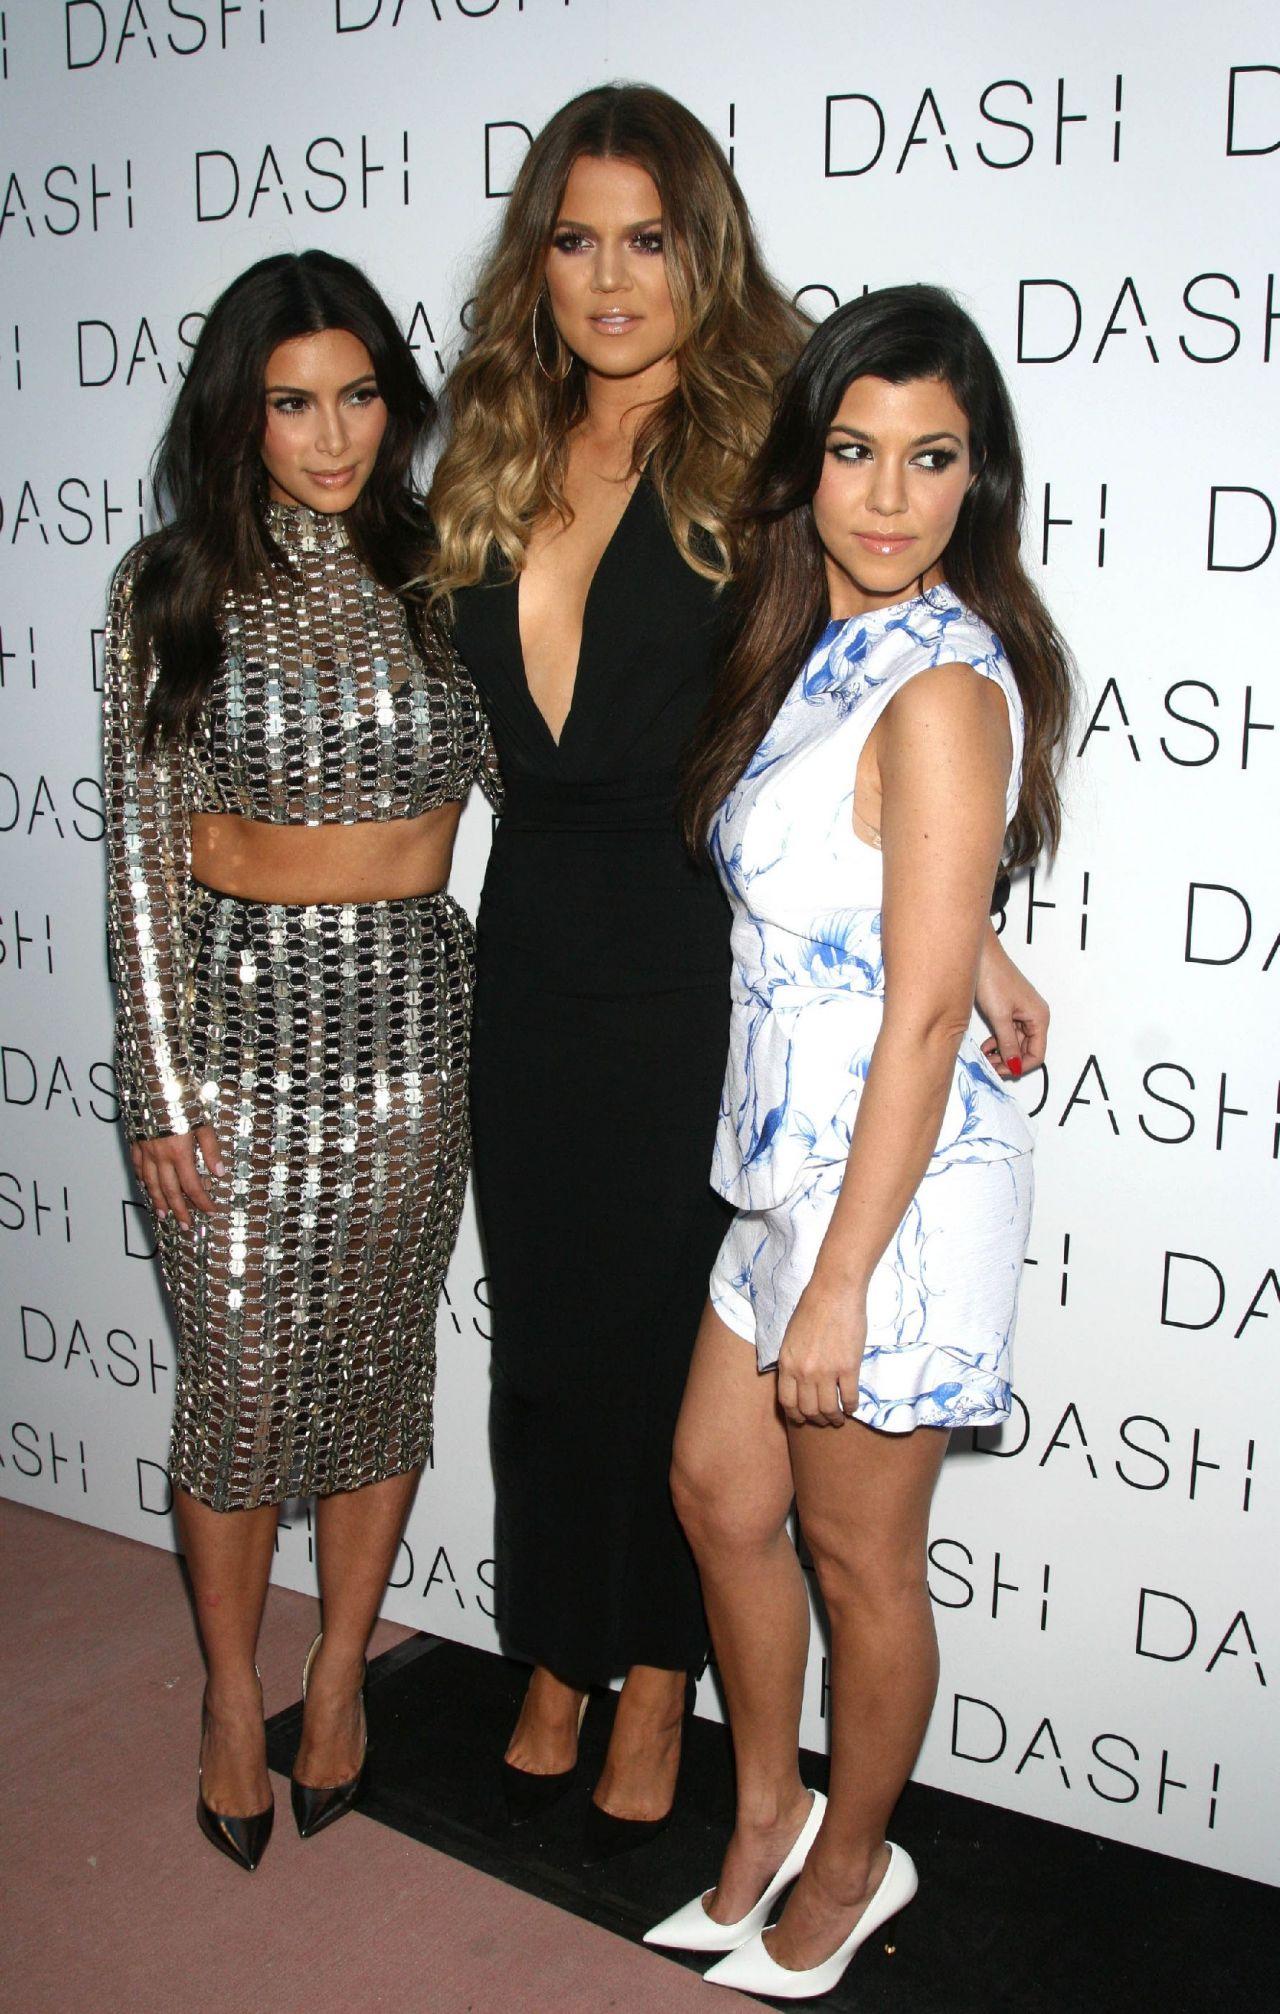 Khloé, Kourtney, and Kim Kardashian Got into a Heated Twitter Fight During KUWTK advise